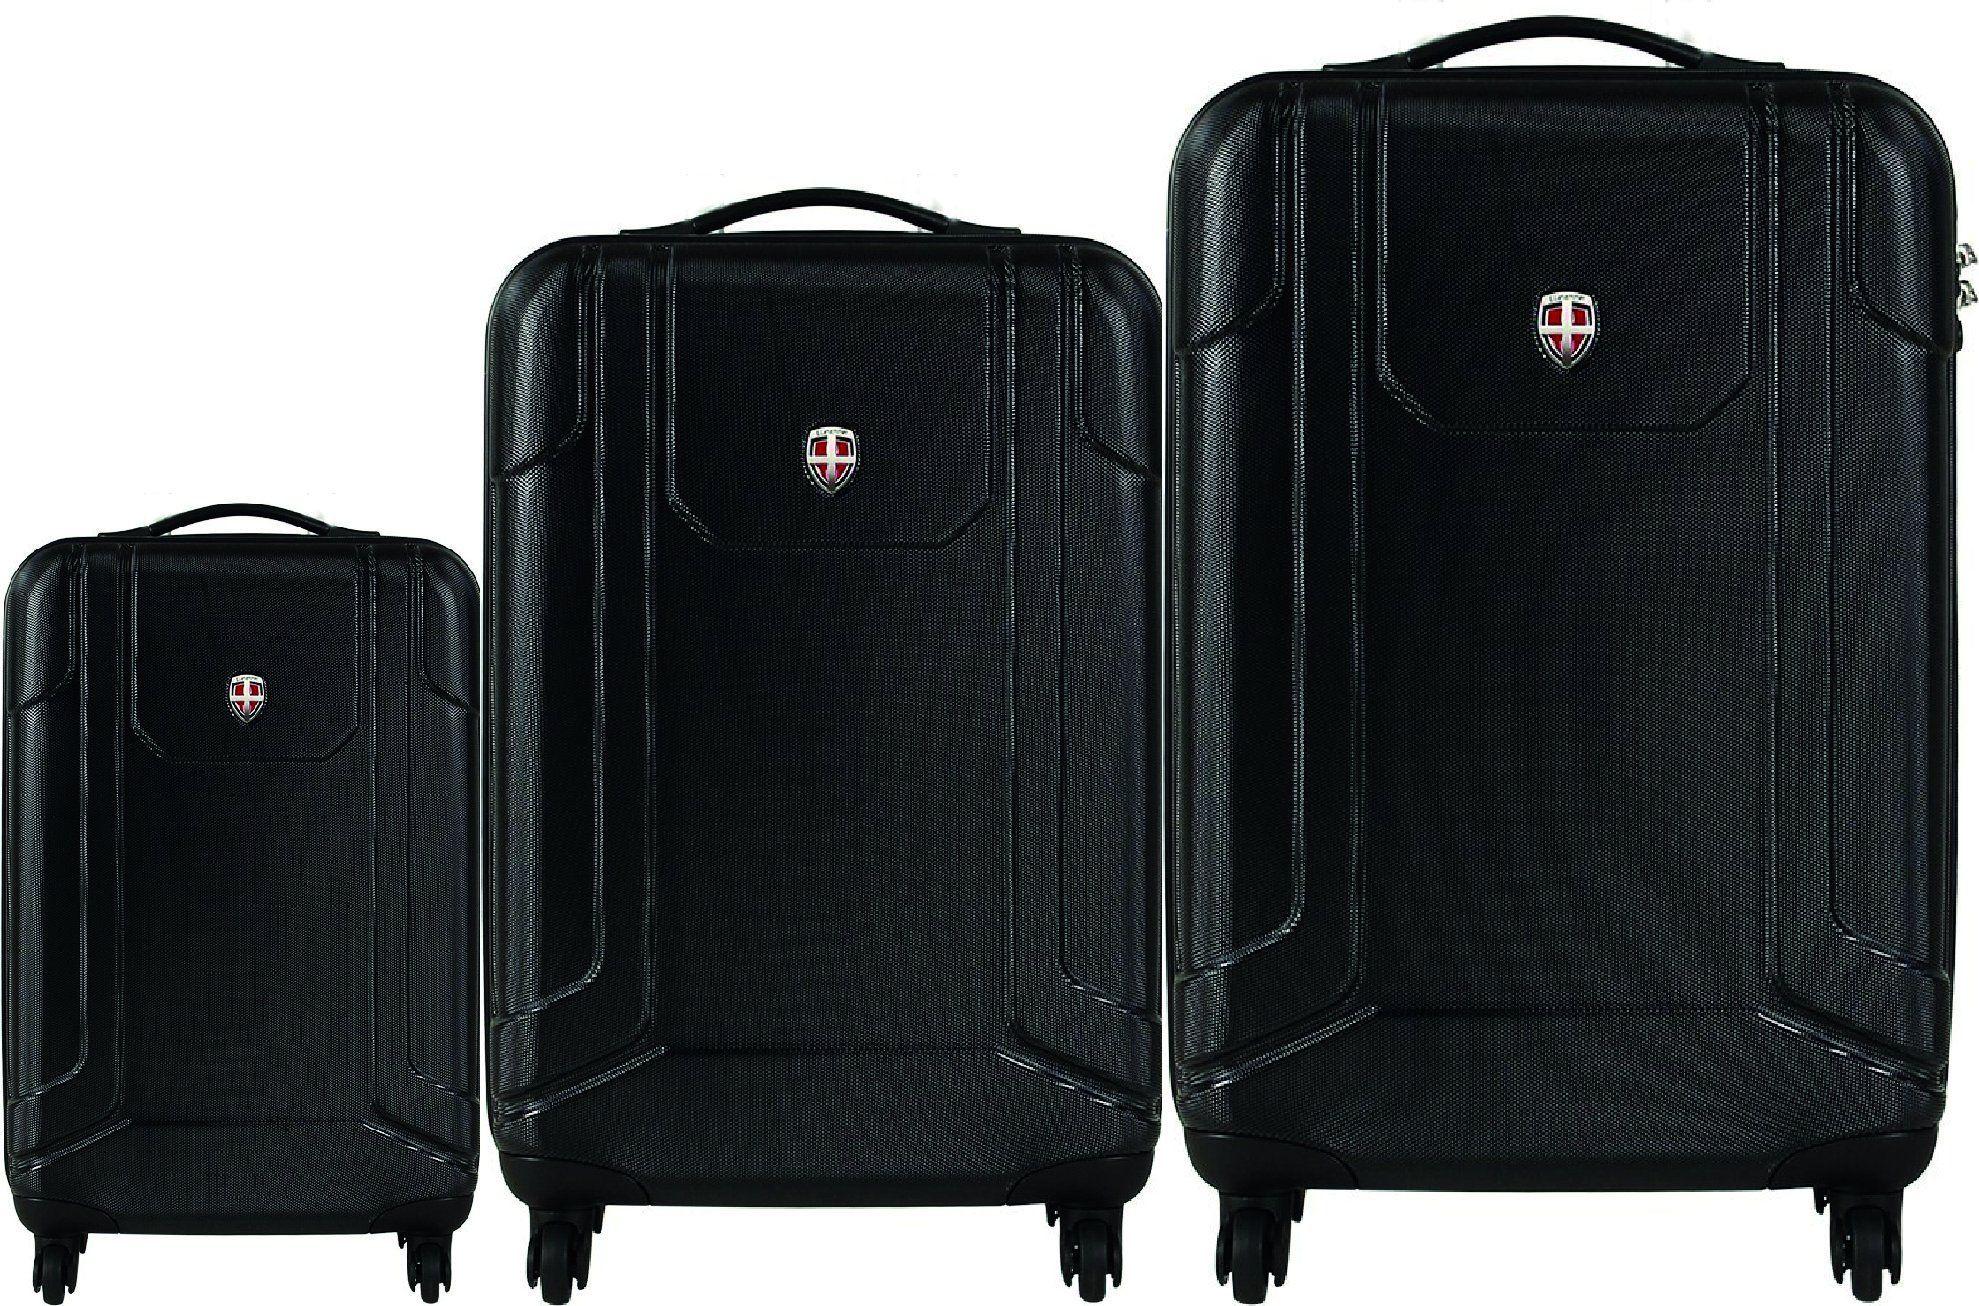 c2cb9959dbd3 Ellehammer Reykjavik 3 Part Spinner Trolley Set Hard Shell Including Cabin  Size (Black)  Amazon.co.uk  Luggage £399.99 reduced to £199.98